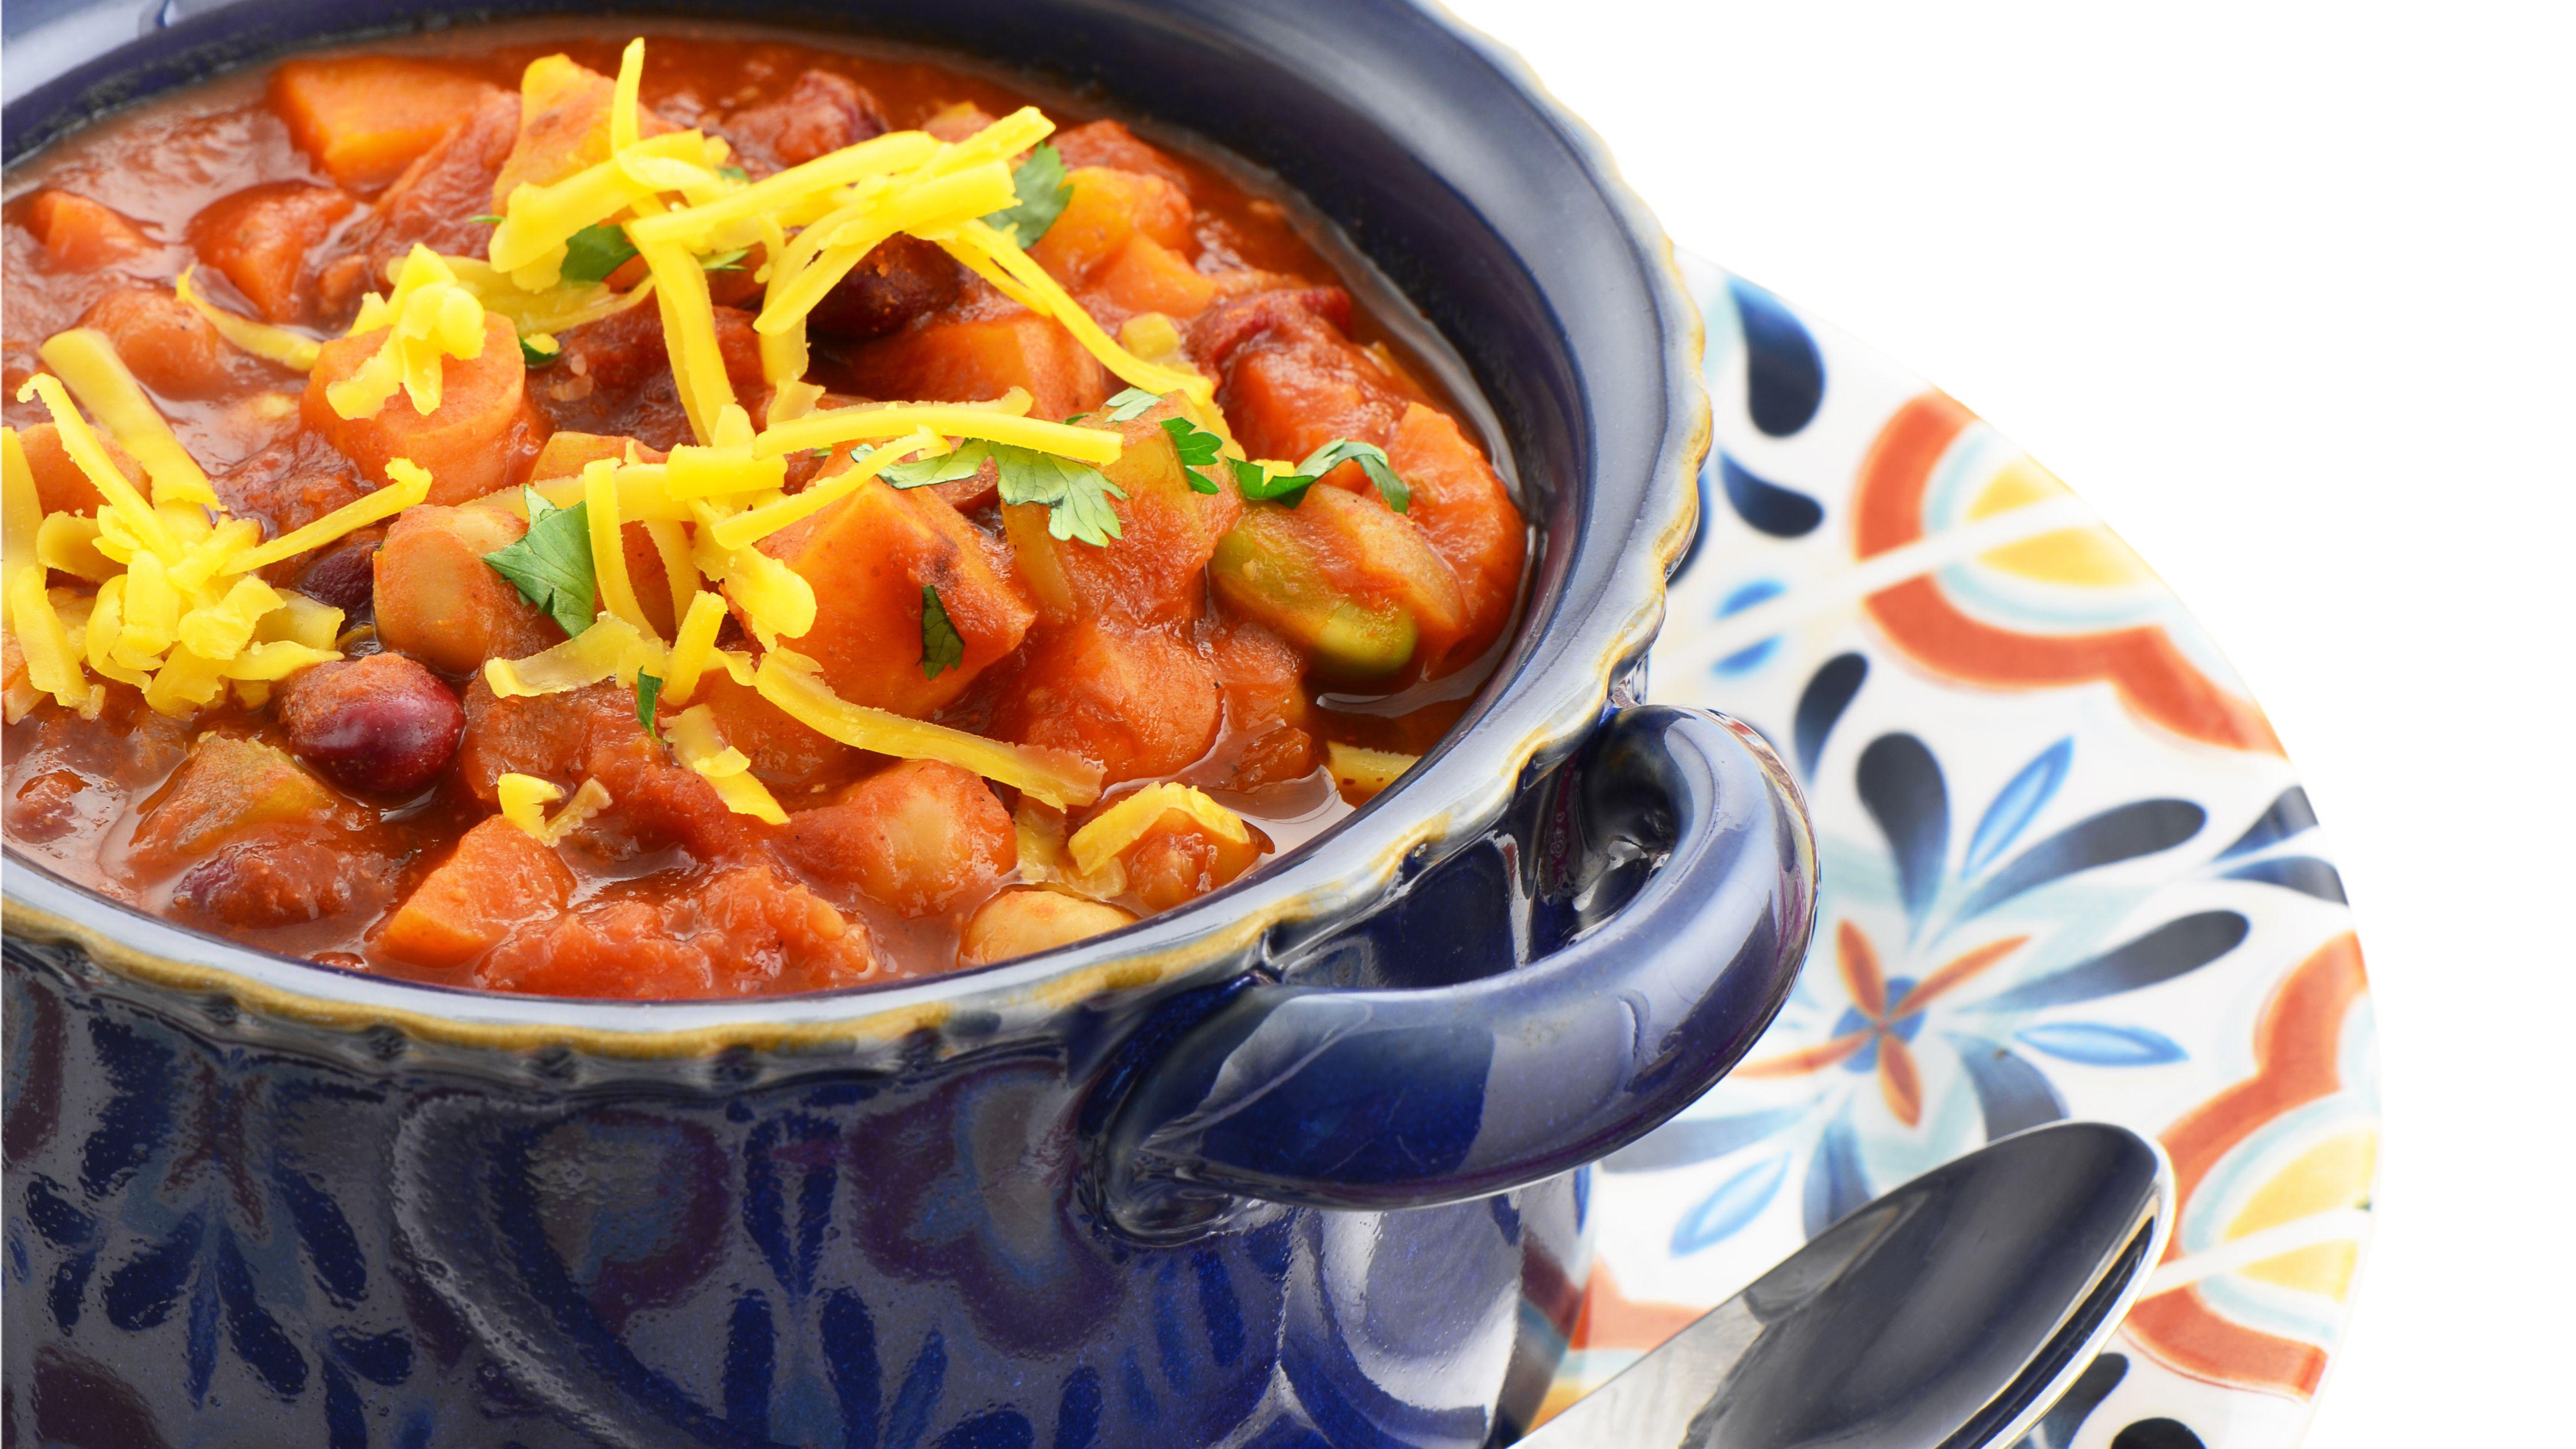 Gluten Free Vegan Crockpot Chili Recipe